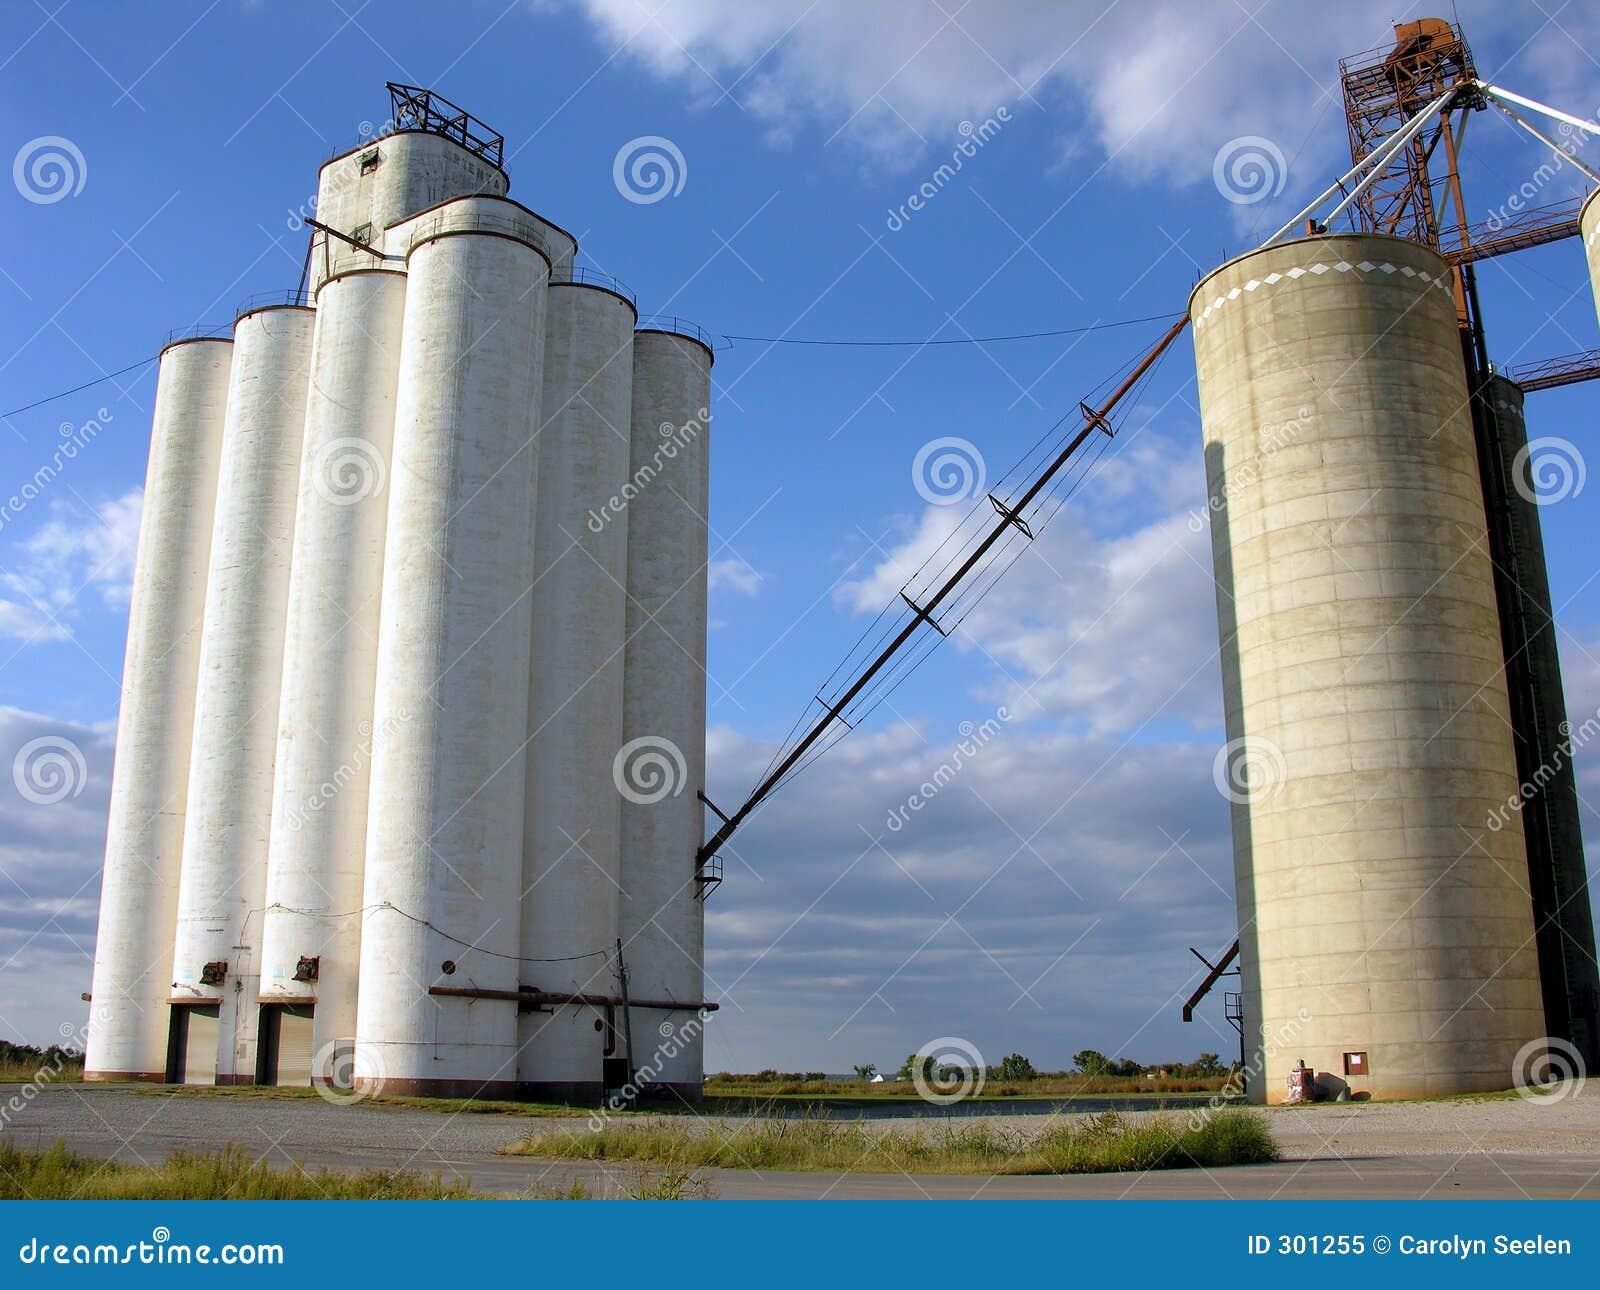 Grain Silos and Elevator